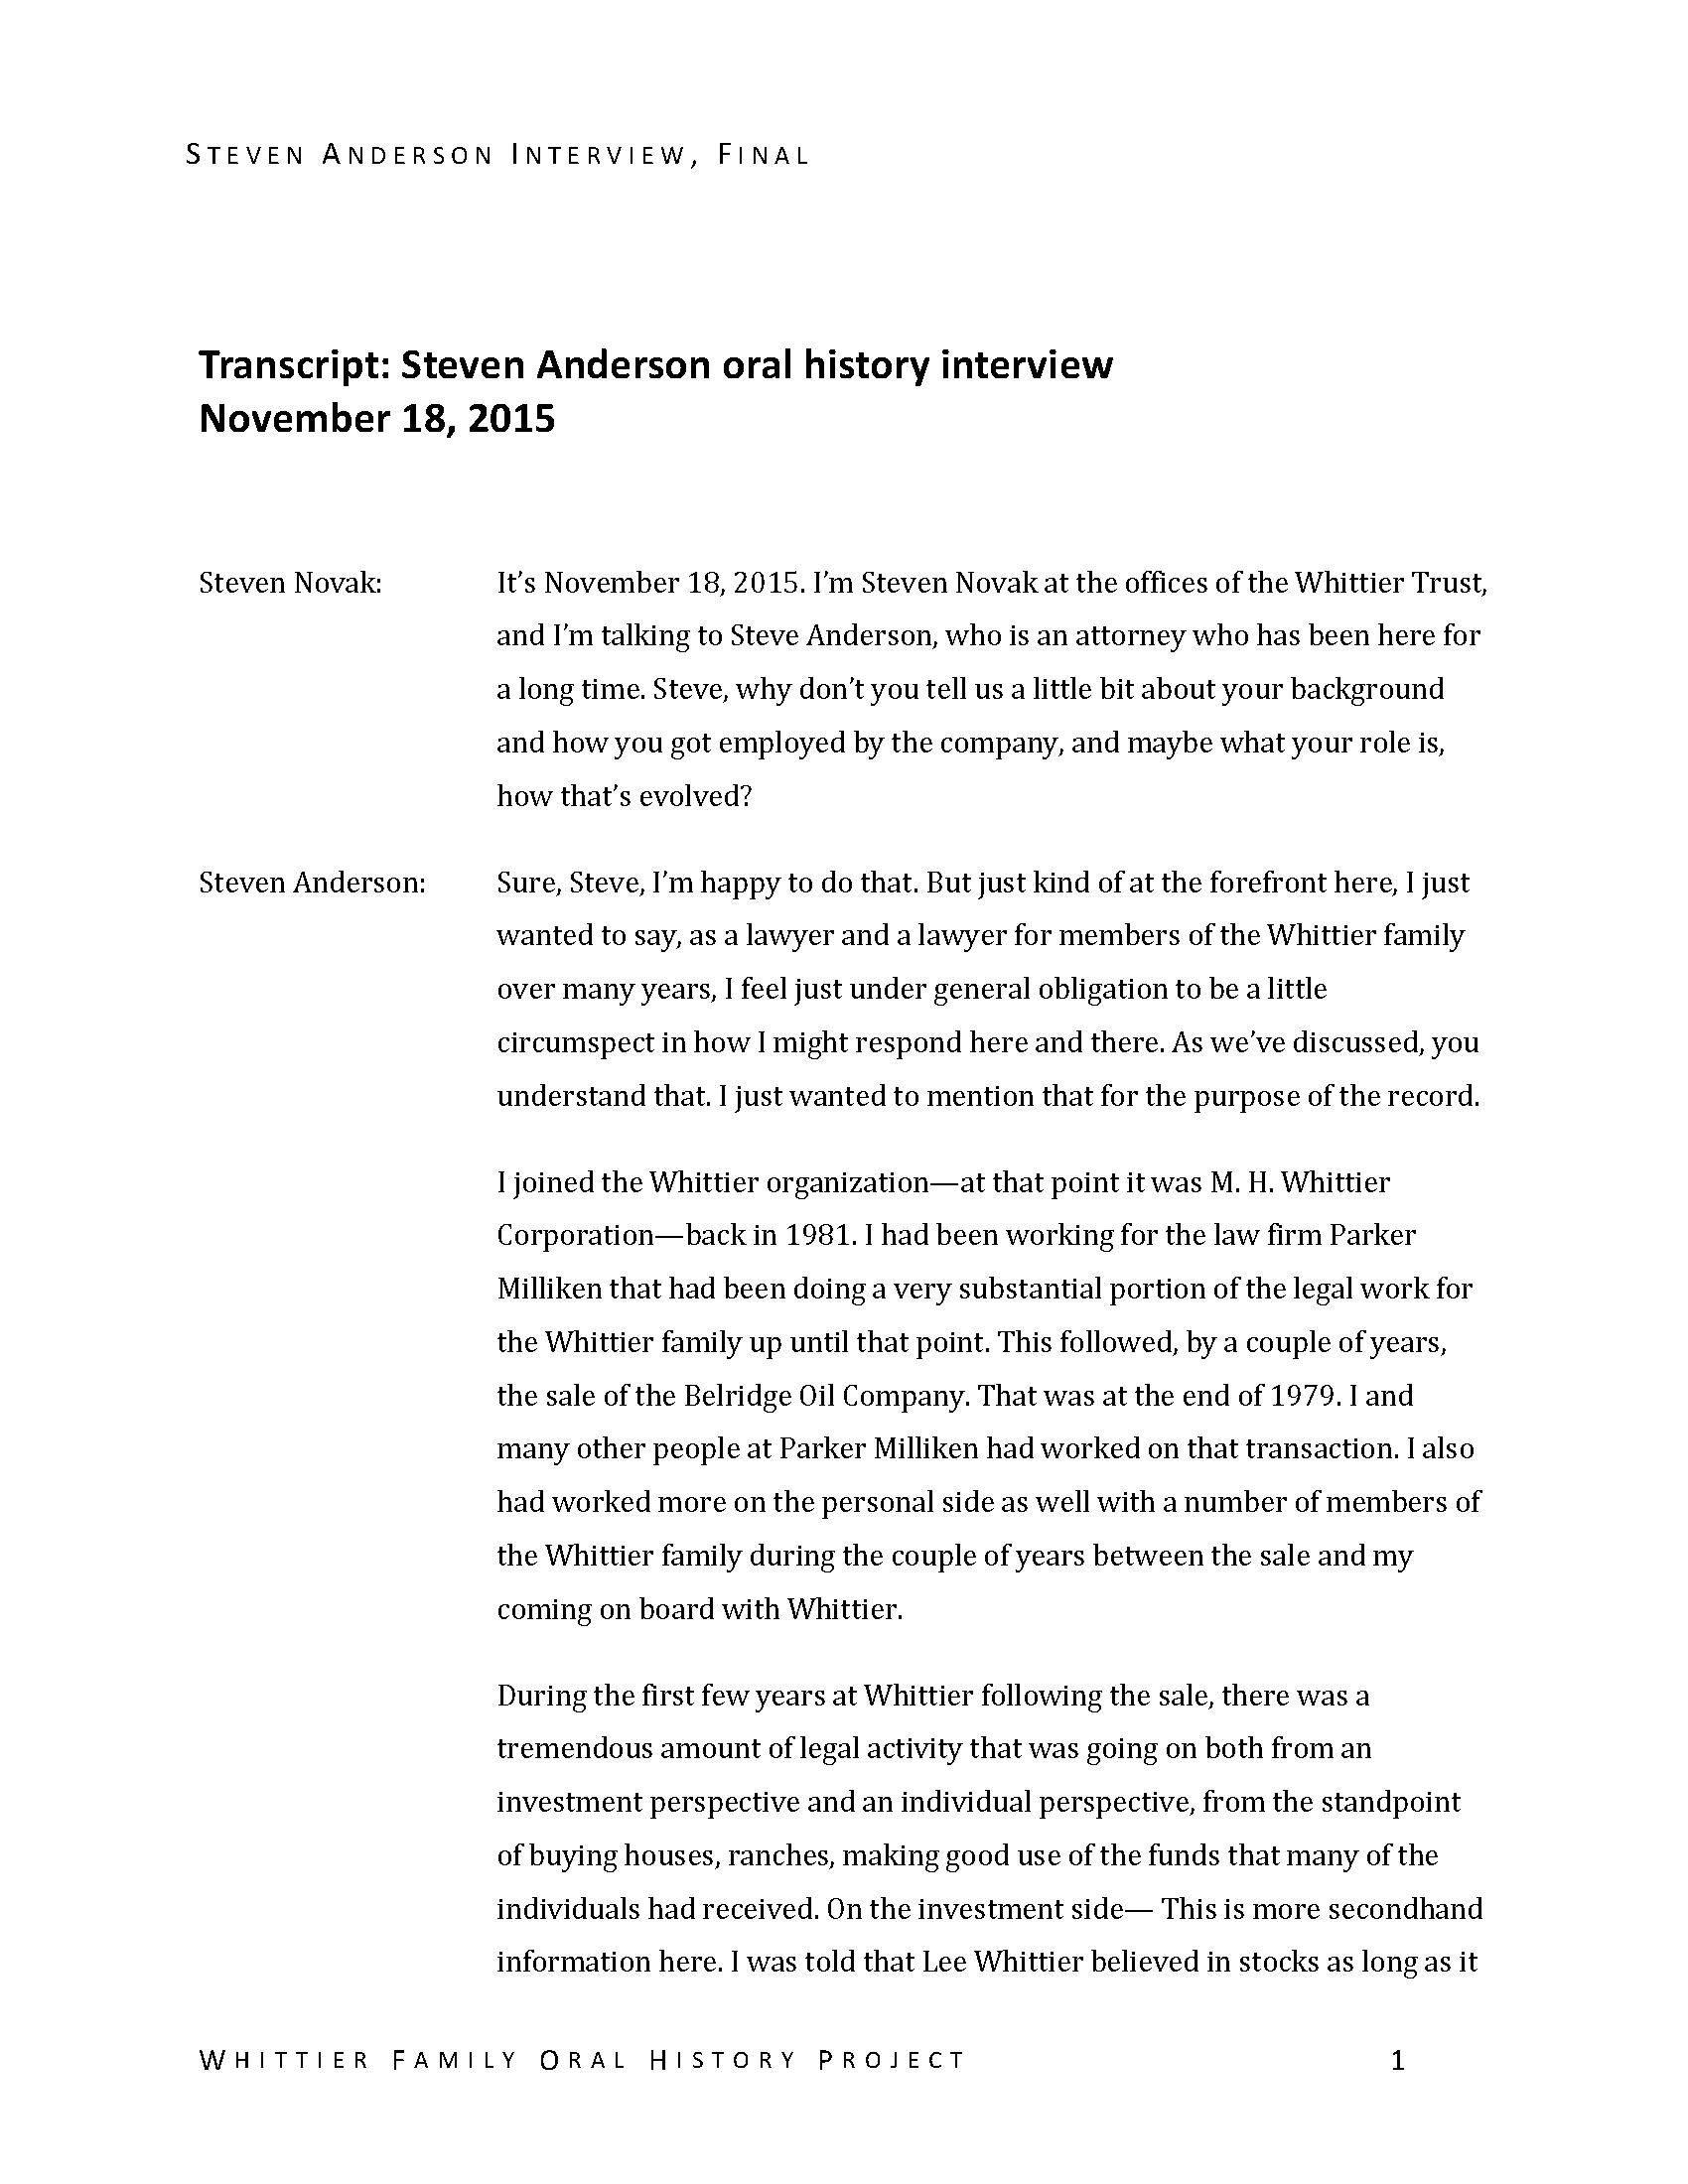 Steven Anderson oral history interview  - Manuscripts - Huntington